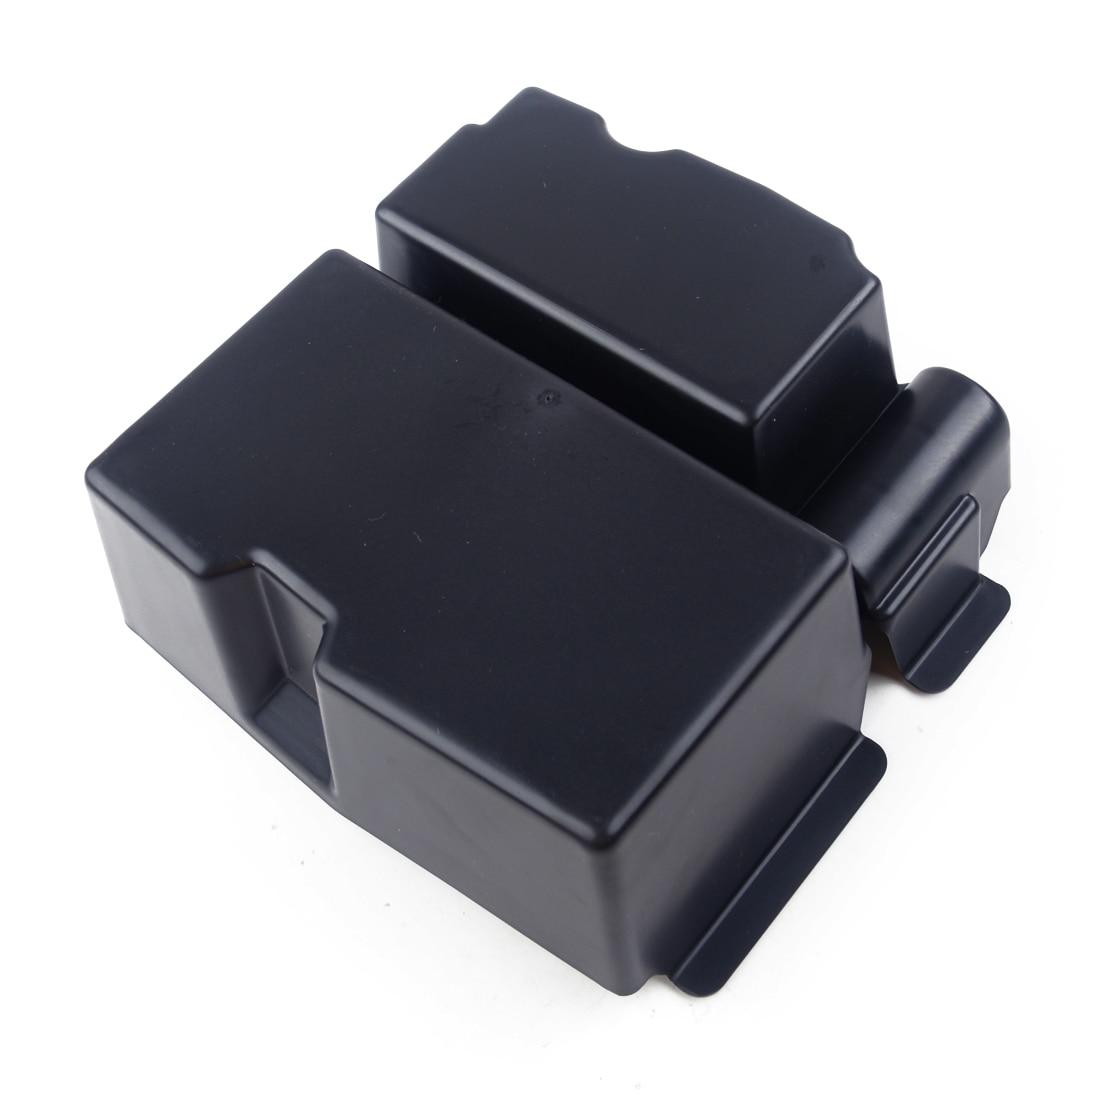 dwcx center console caixa de armazenamento apoio 04